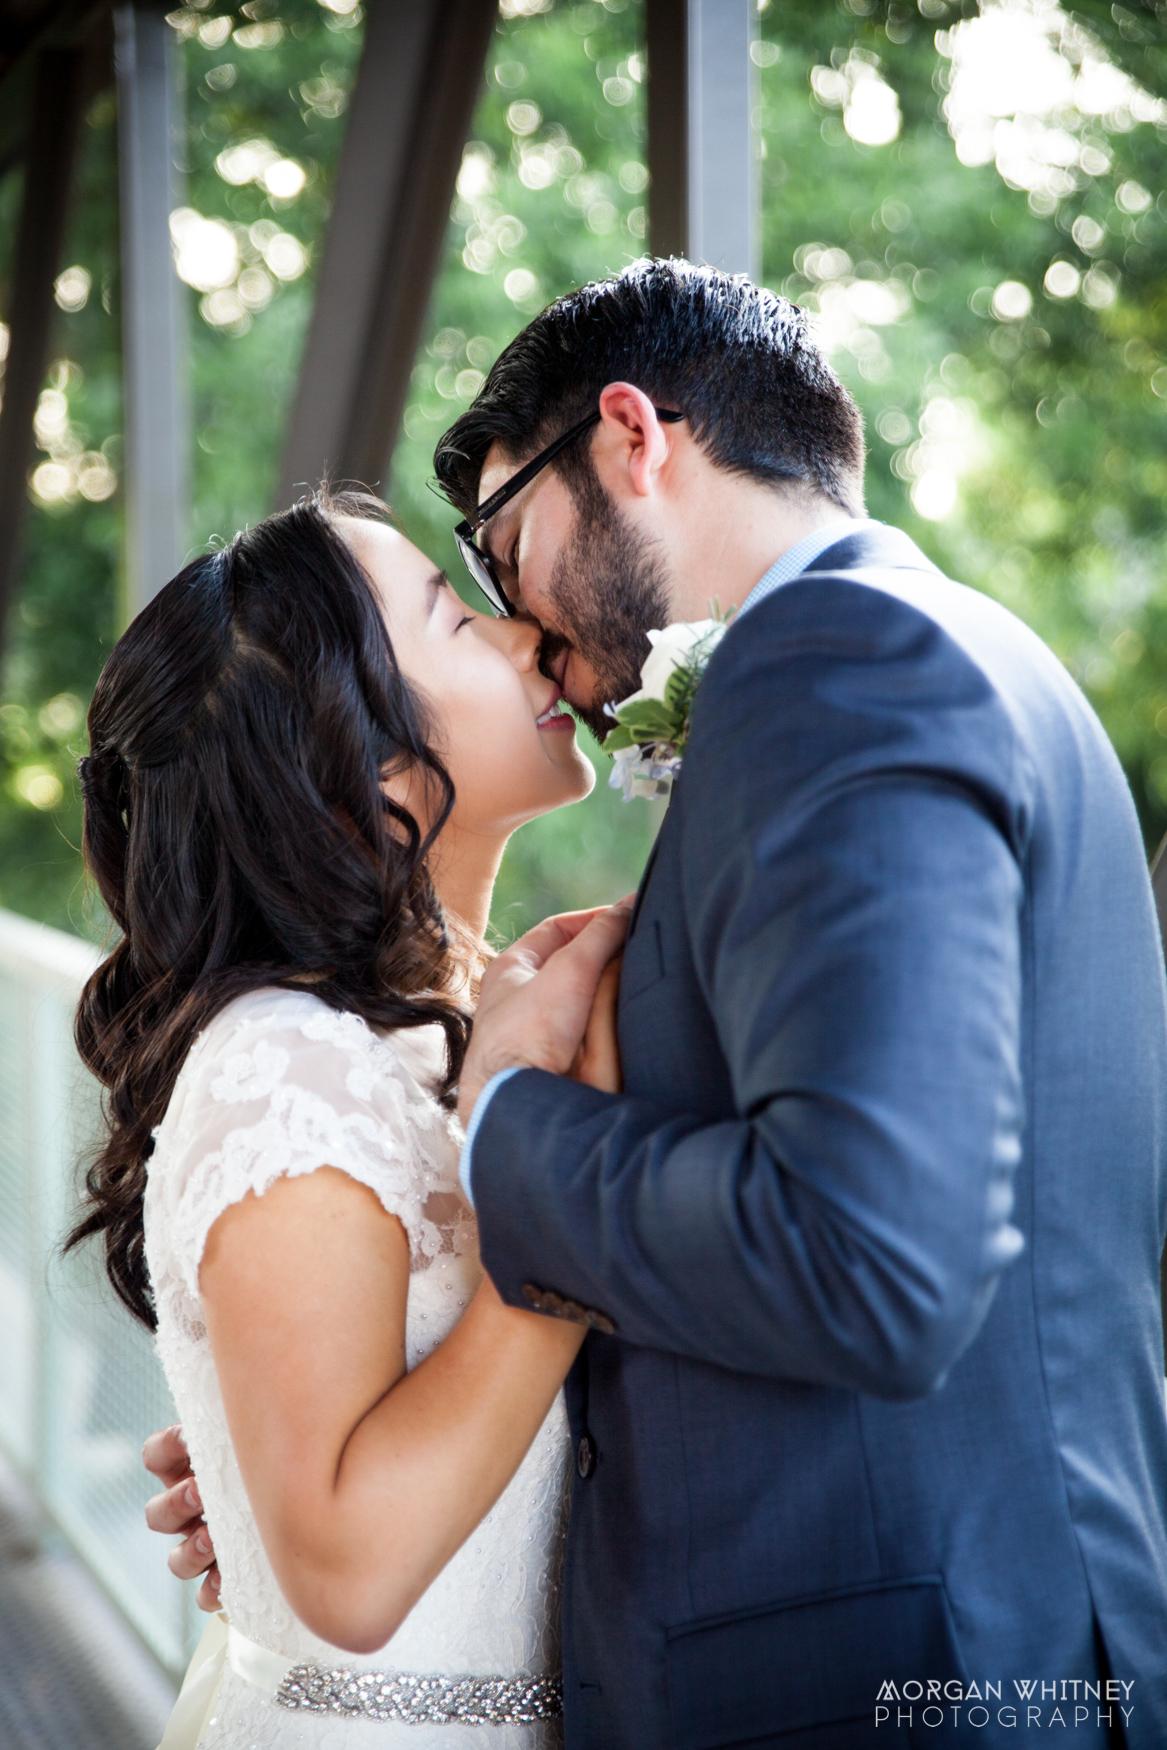 Jake + Bridget's San Antonio Wedding at Supper {Hotel Emma} and theirBackyard